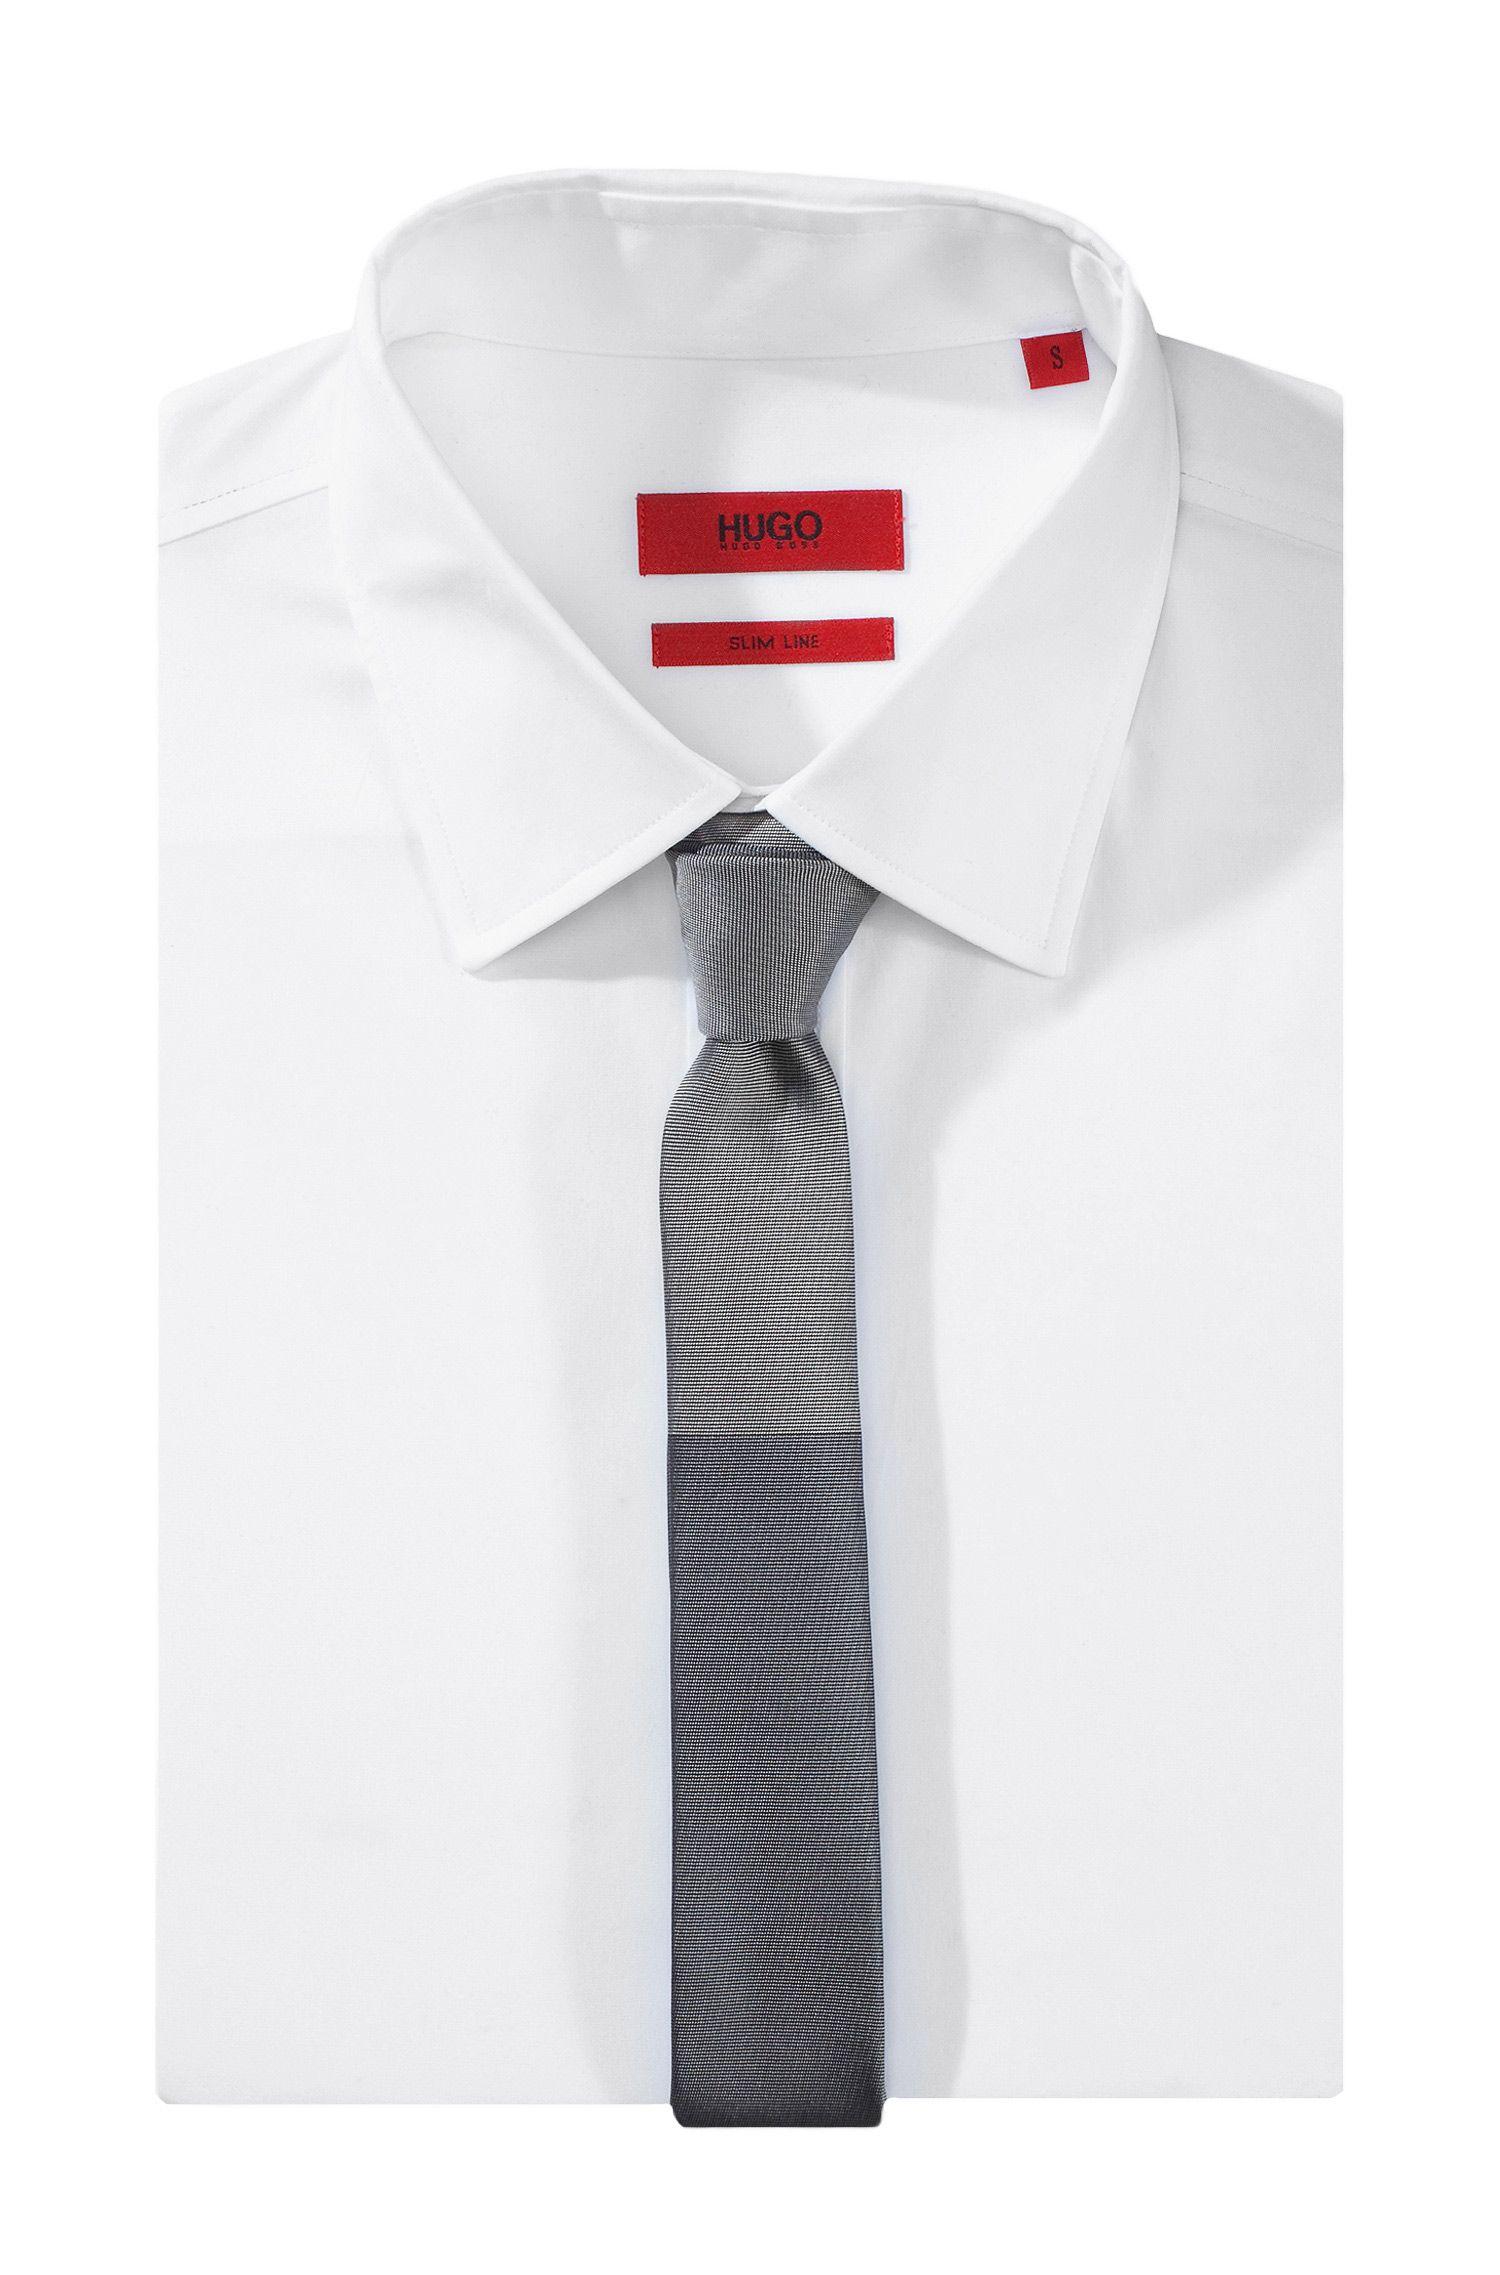 Cravate en soie, Tie 4,5 cm